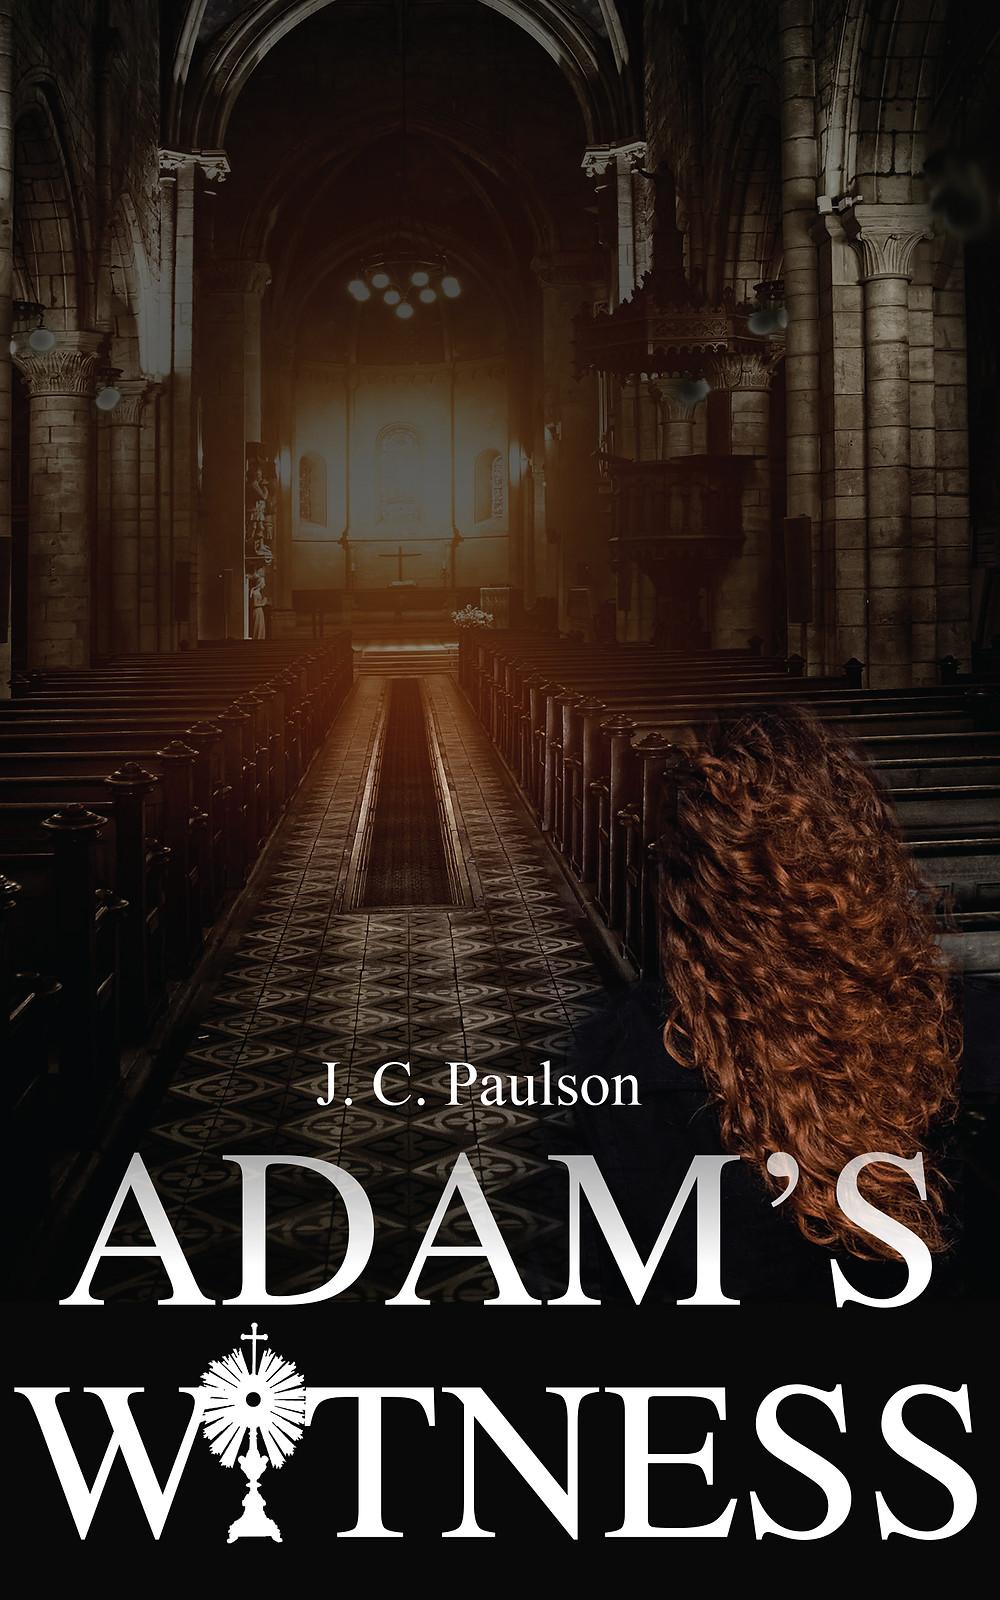 Adam's Witness book cover